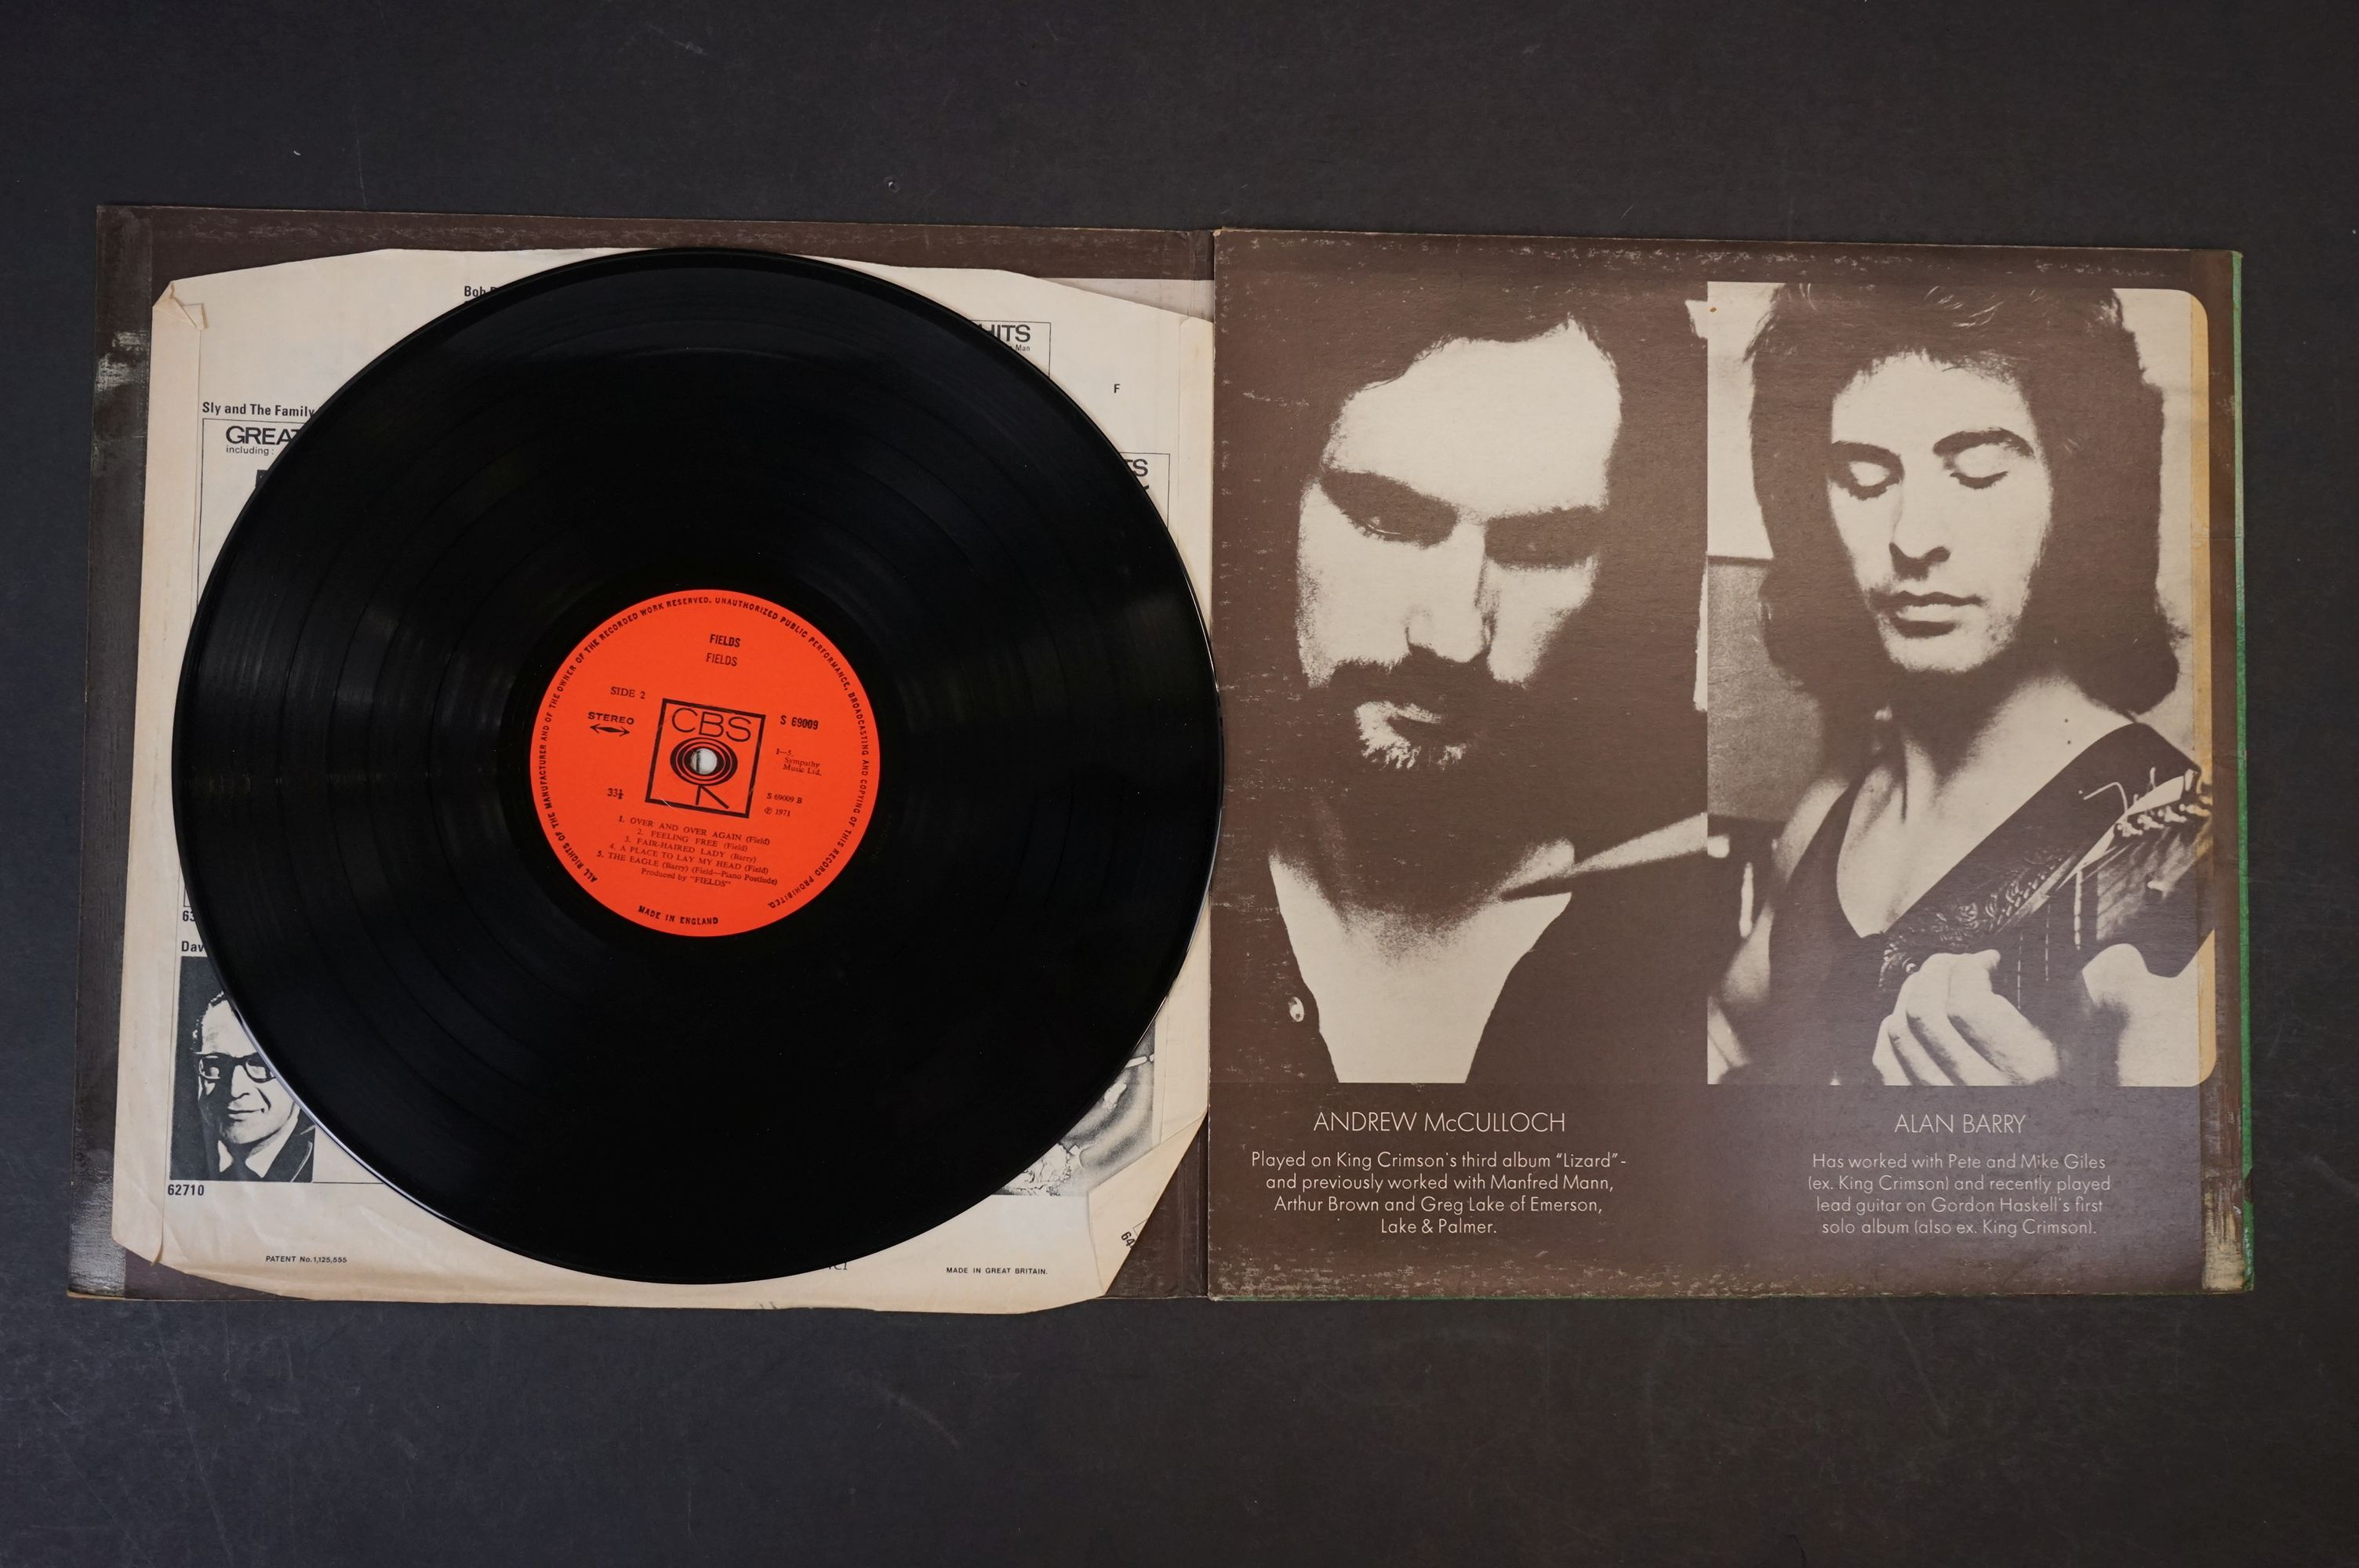 Vinyl - Prog Rock - Fields - Fields. UK 1st 1971 pressing with scarce poster, gatefold sleeve is - Image 3 of 6